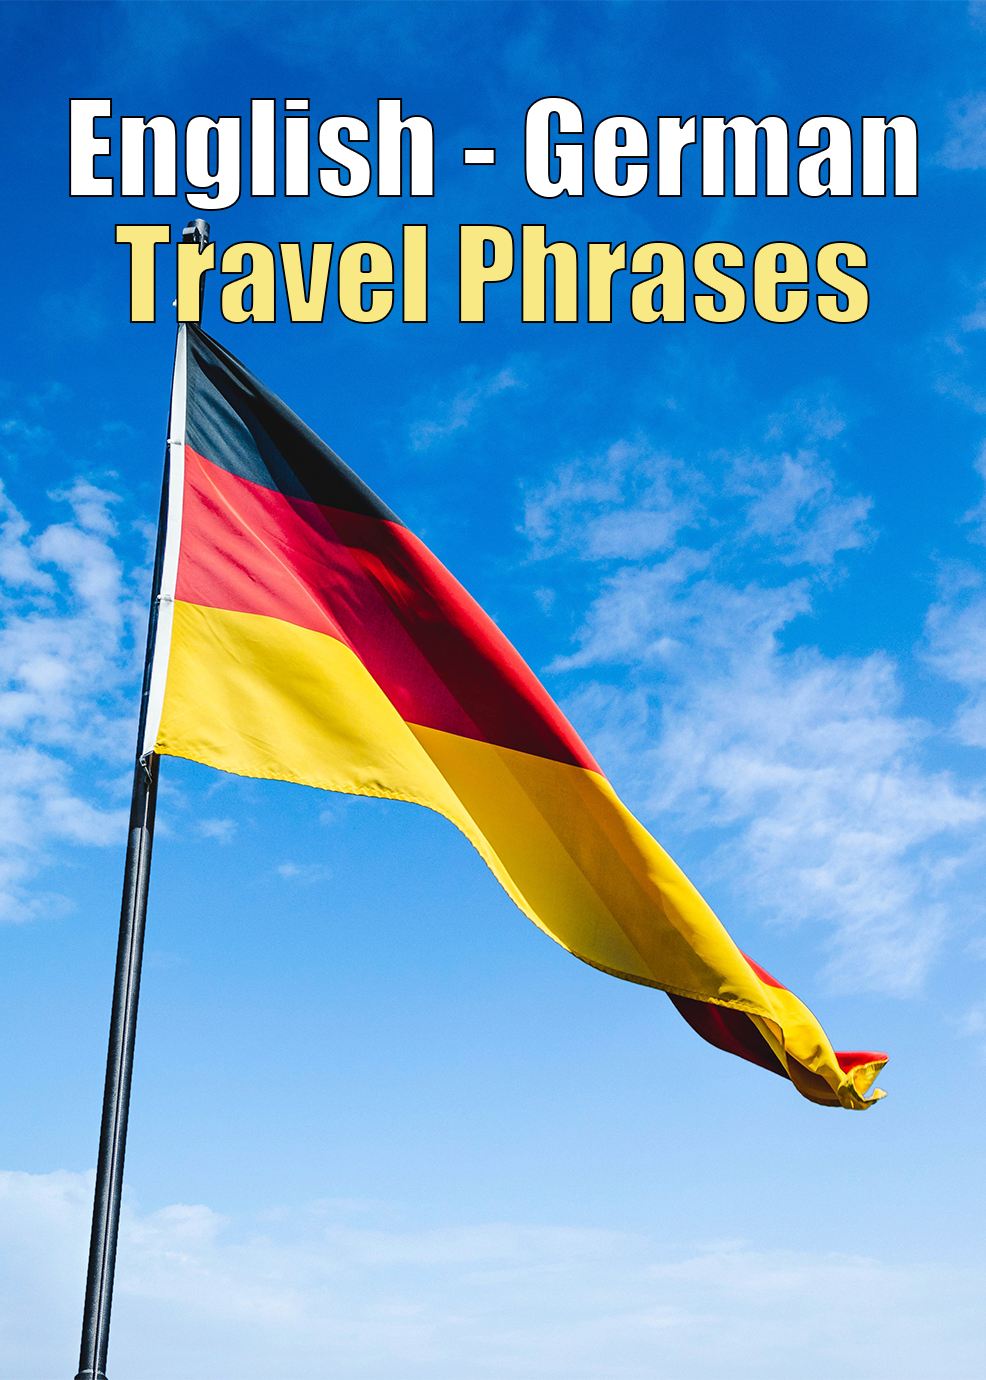 English German Travel Phrases